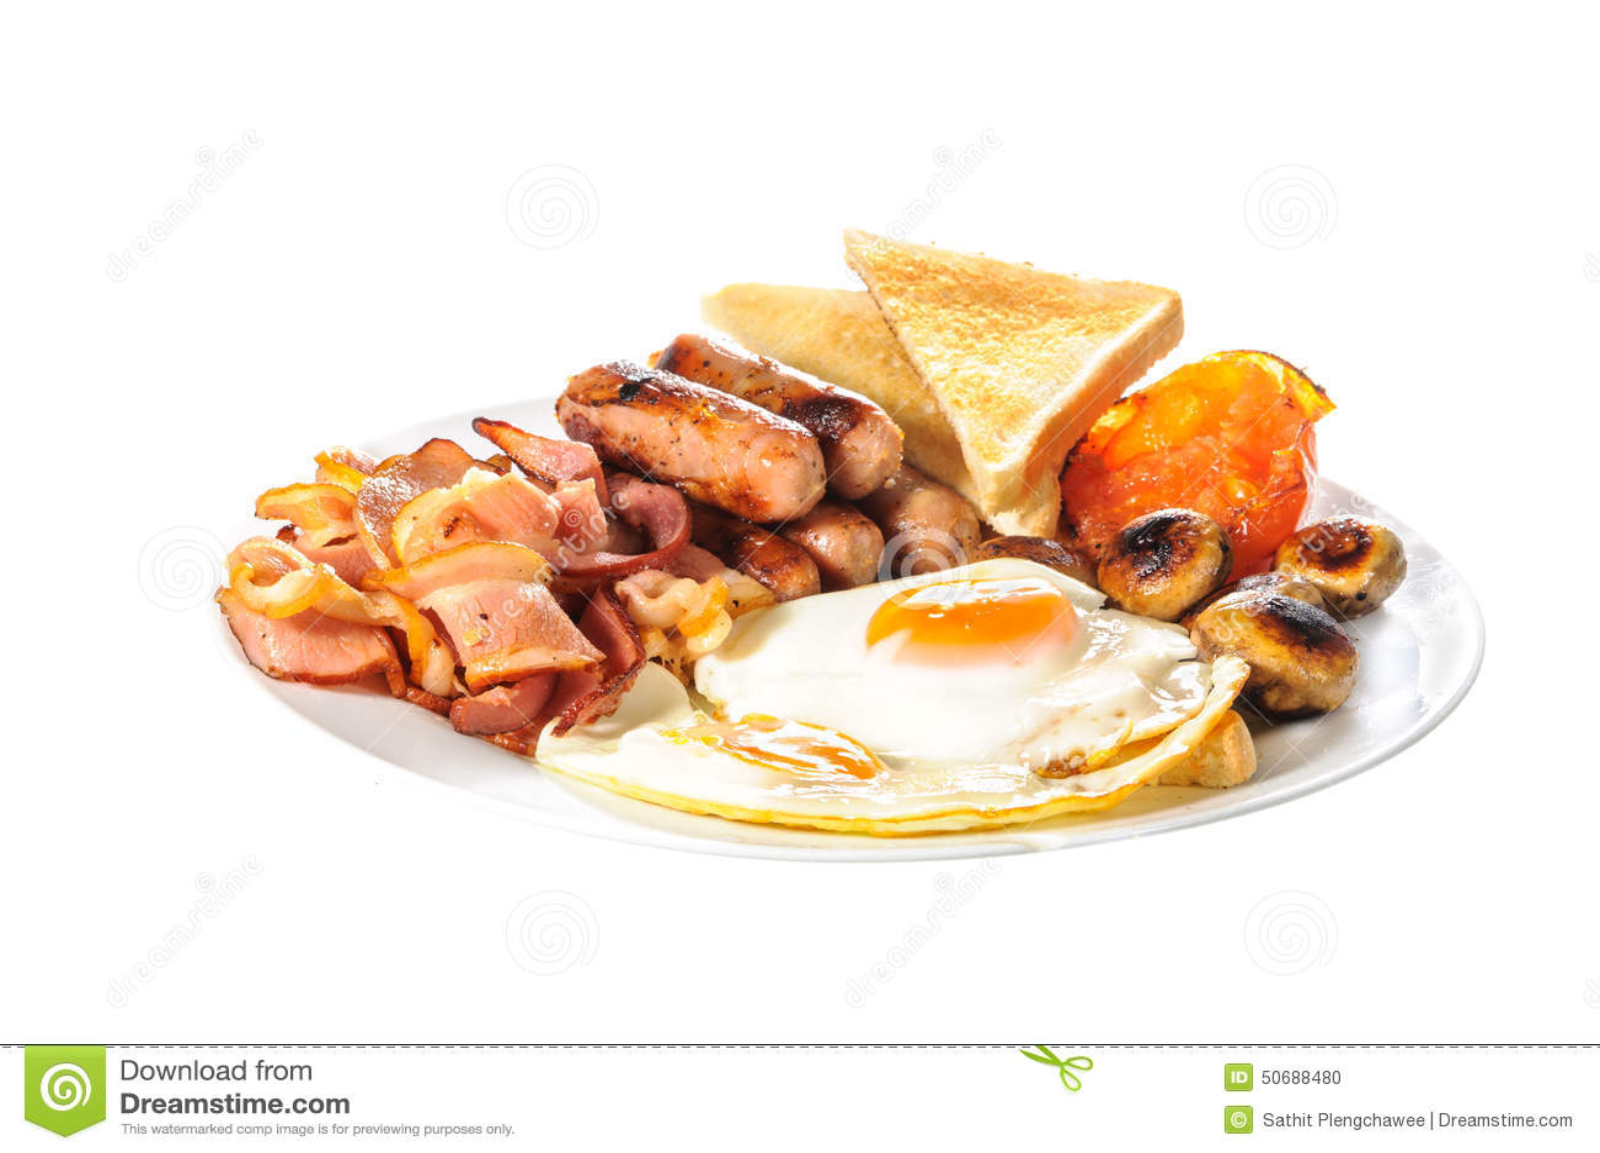 English Big Breakfast Stock Photo - Image: 50688480